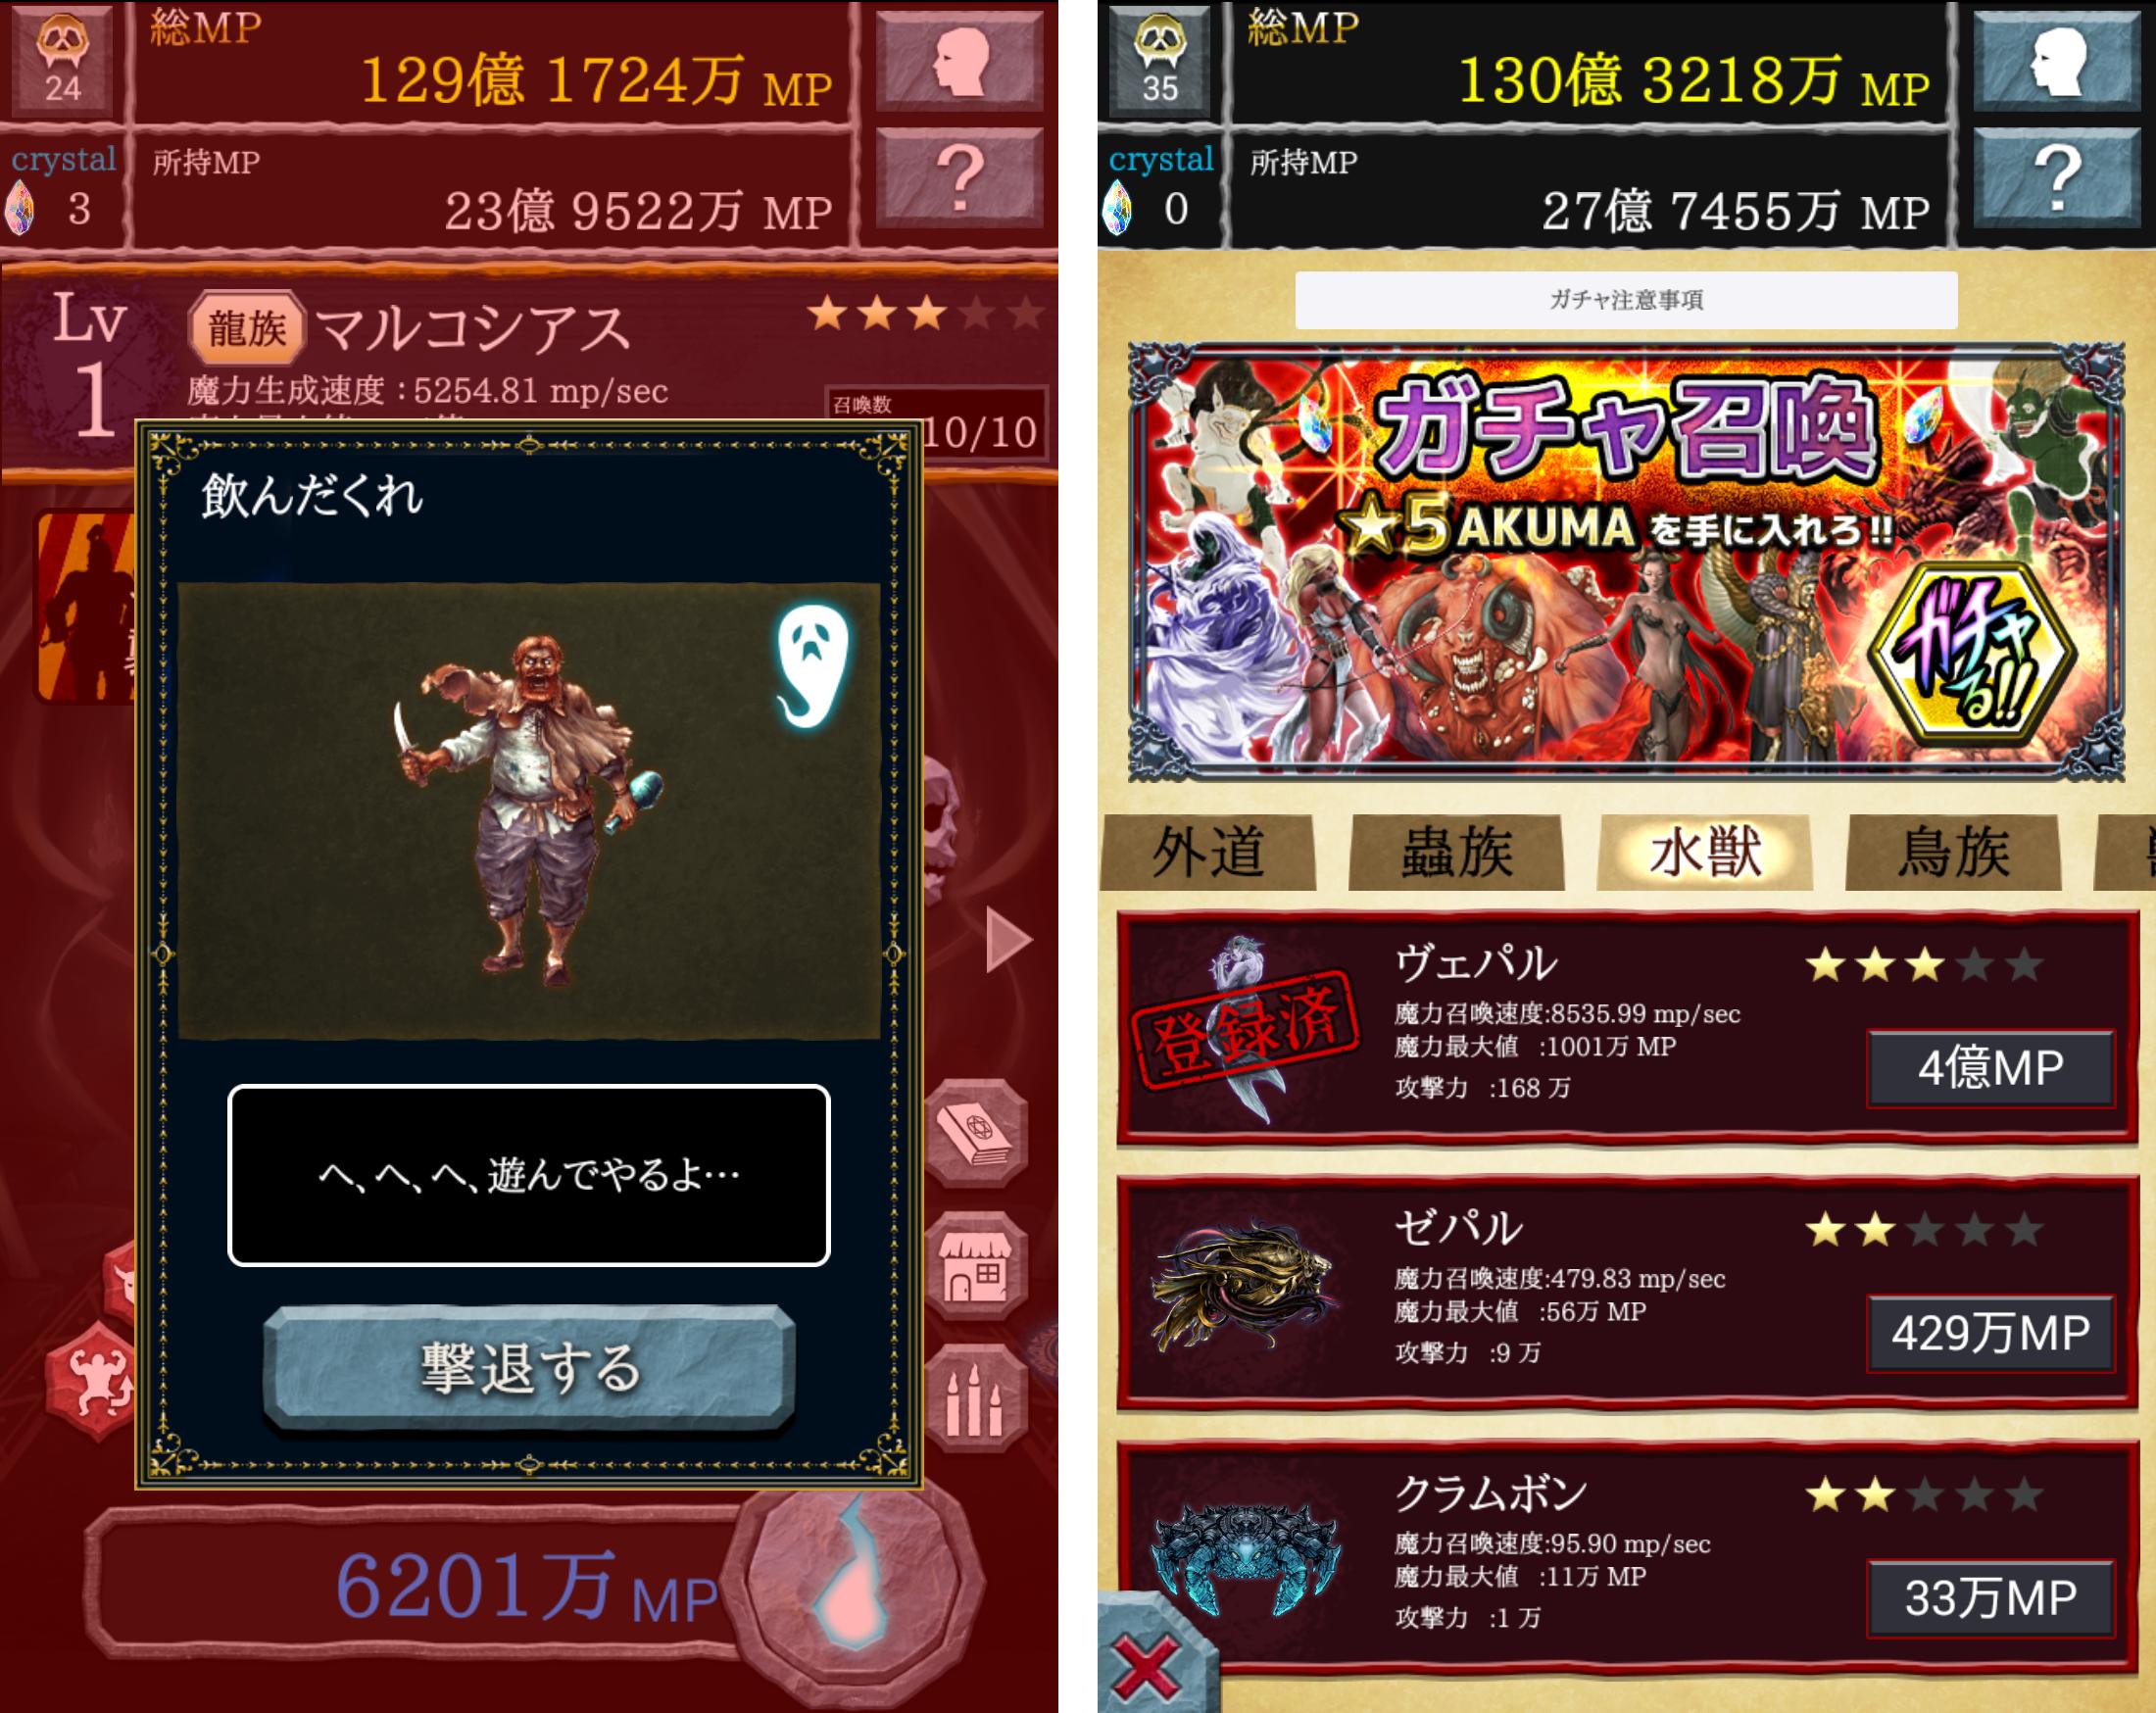 AKUMA大戦 -悪魔合体召喚- androidアプリスクリーンショット3